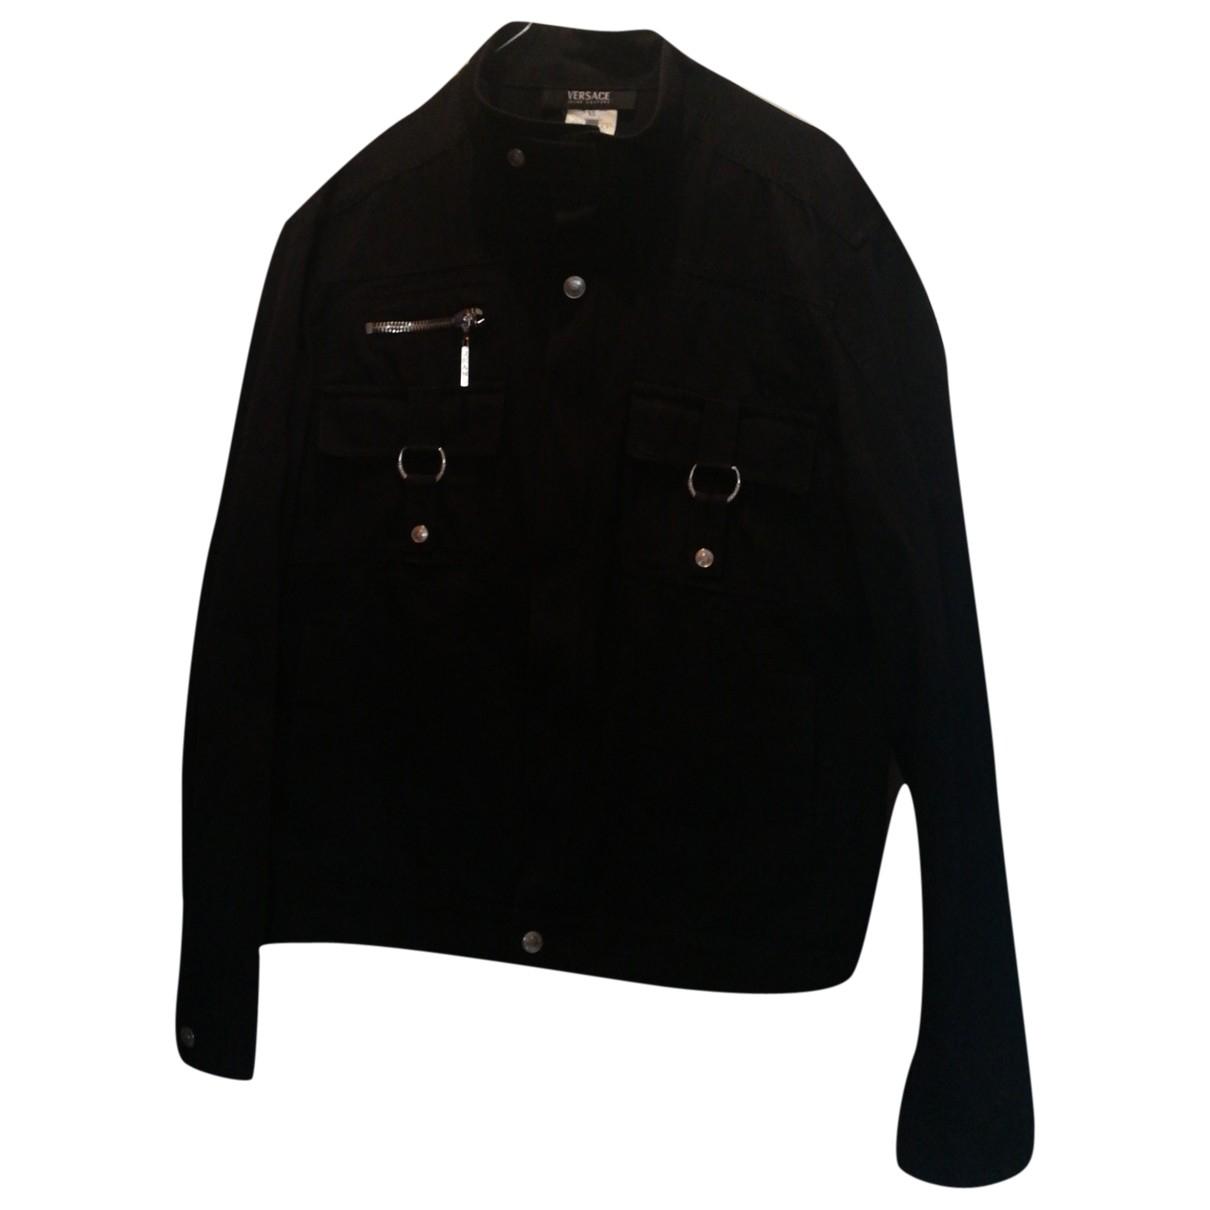 Versace Jeans \N Black Cotton jacket  for Men XL International